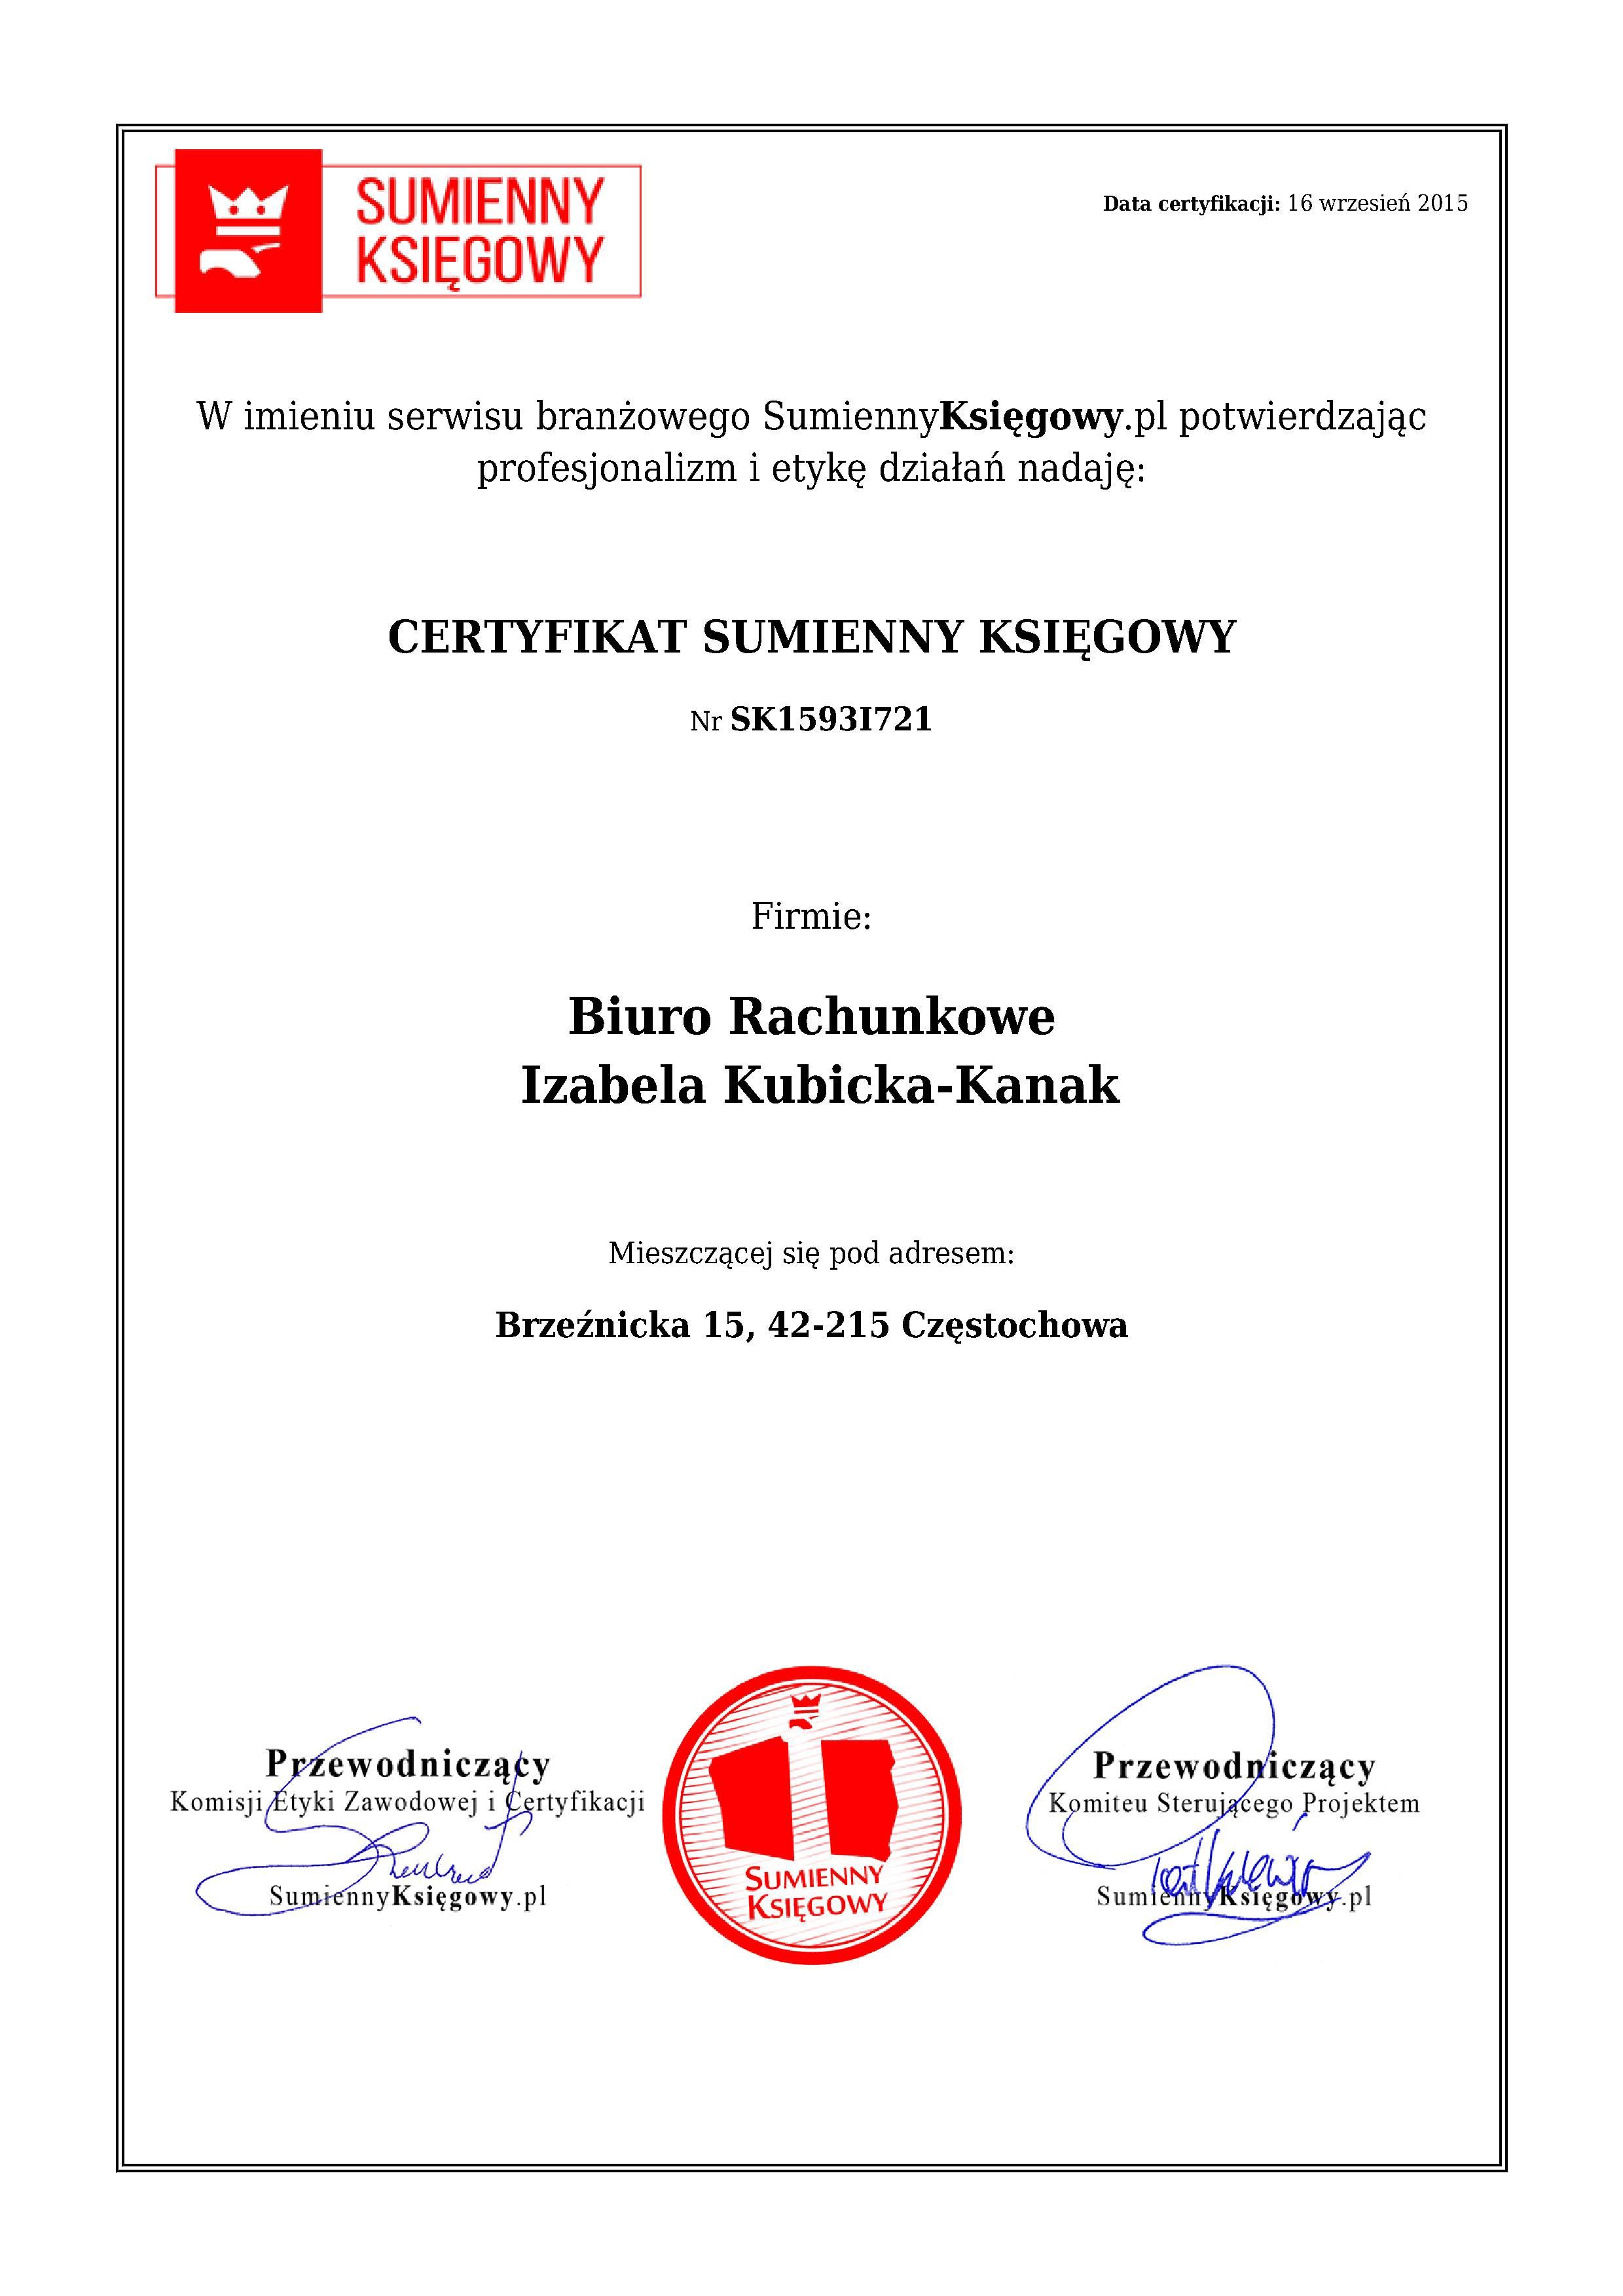 Certyfikat Biuro RachunkoweIzabela Kubicka-Kanak